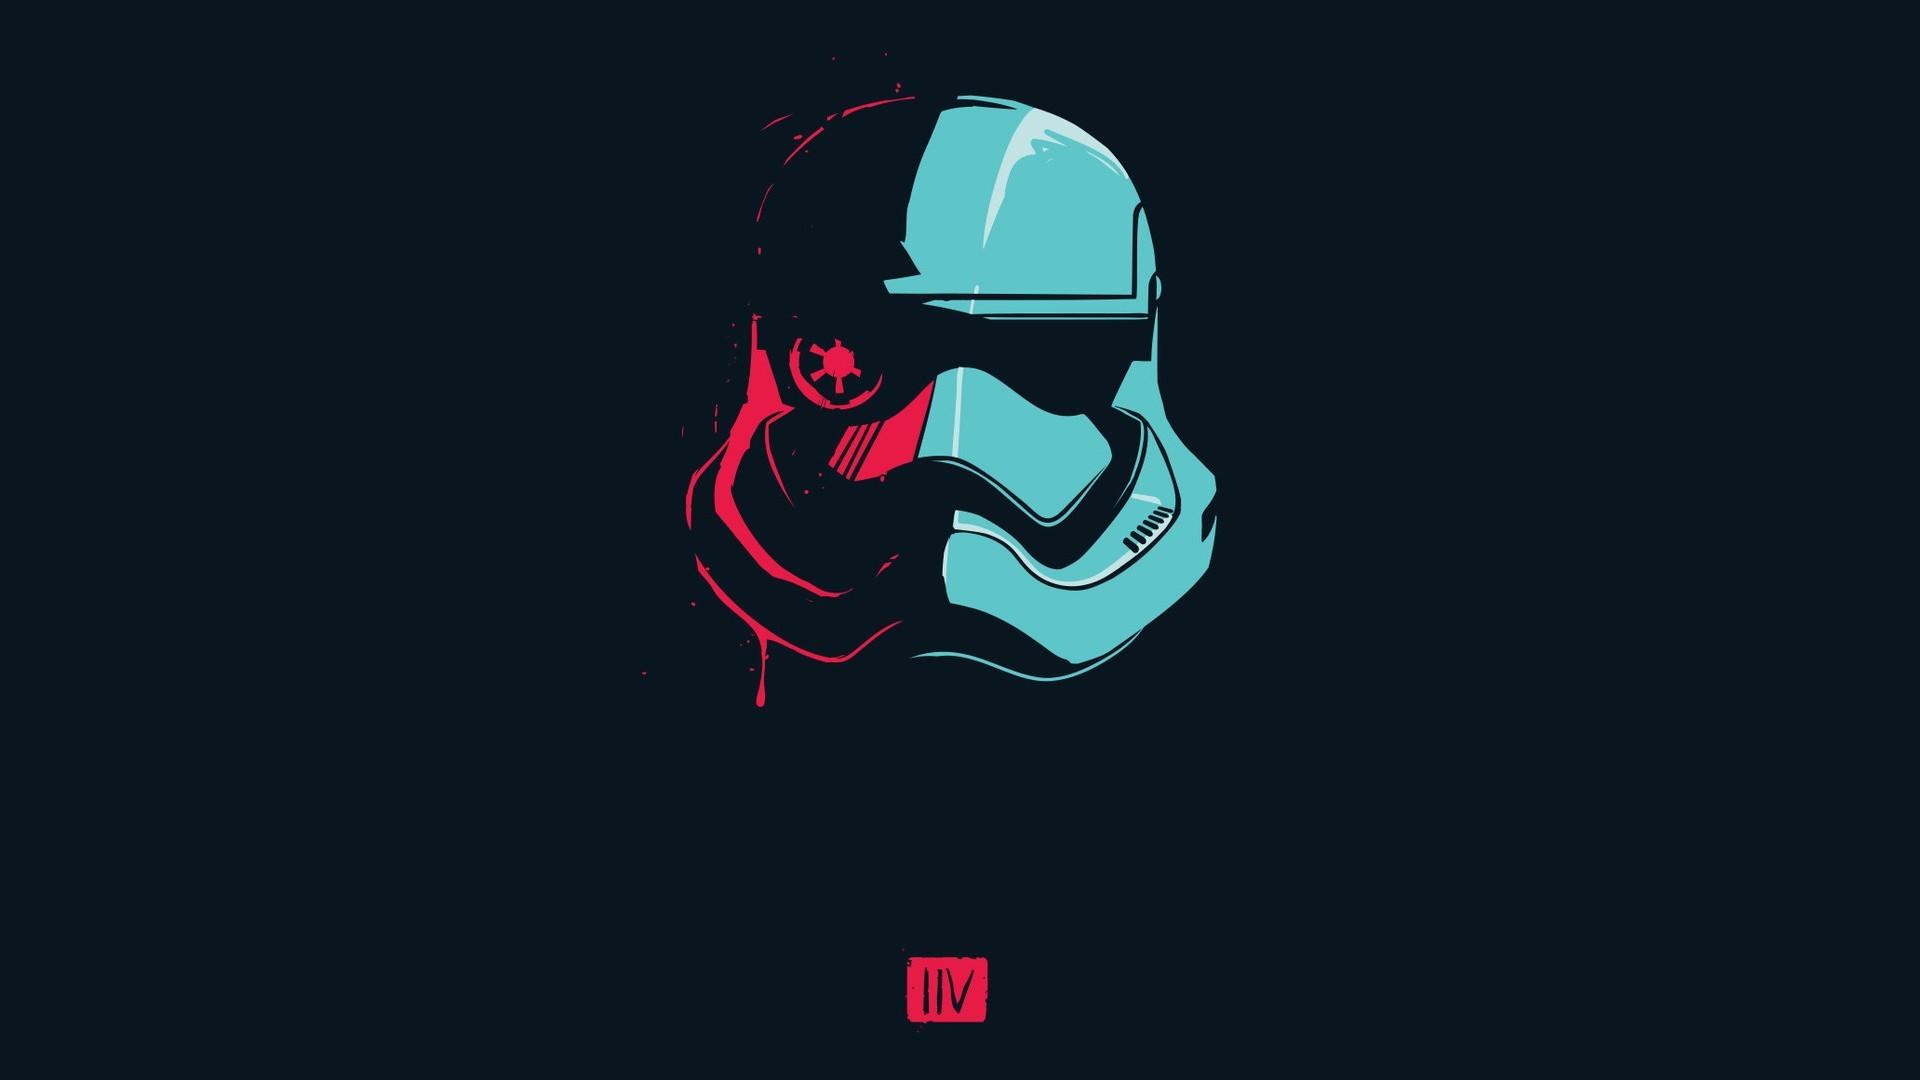 star wars wallpaper hd (80+ images)